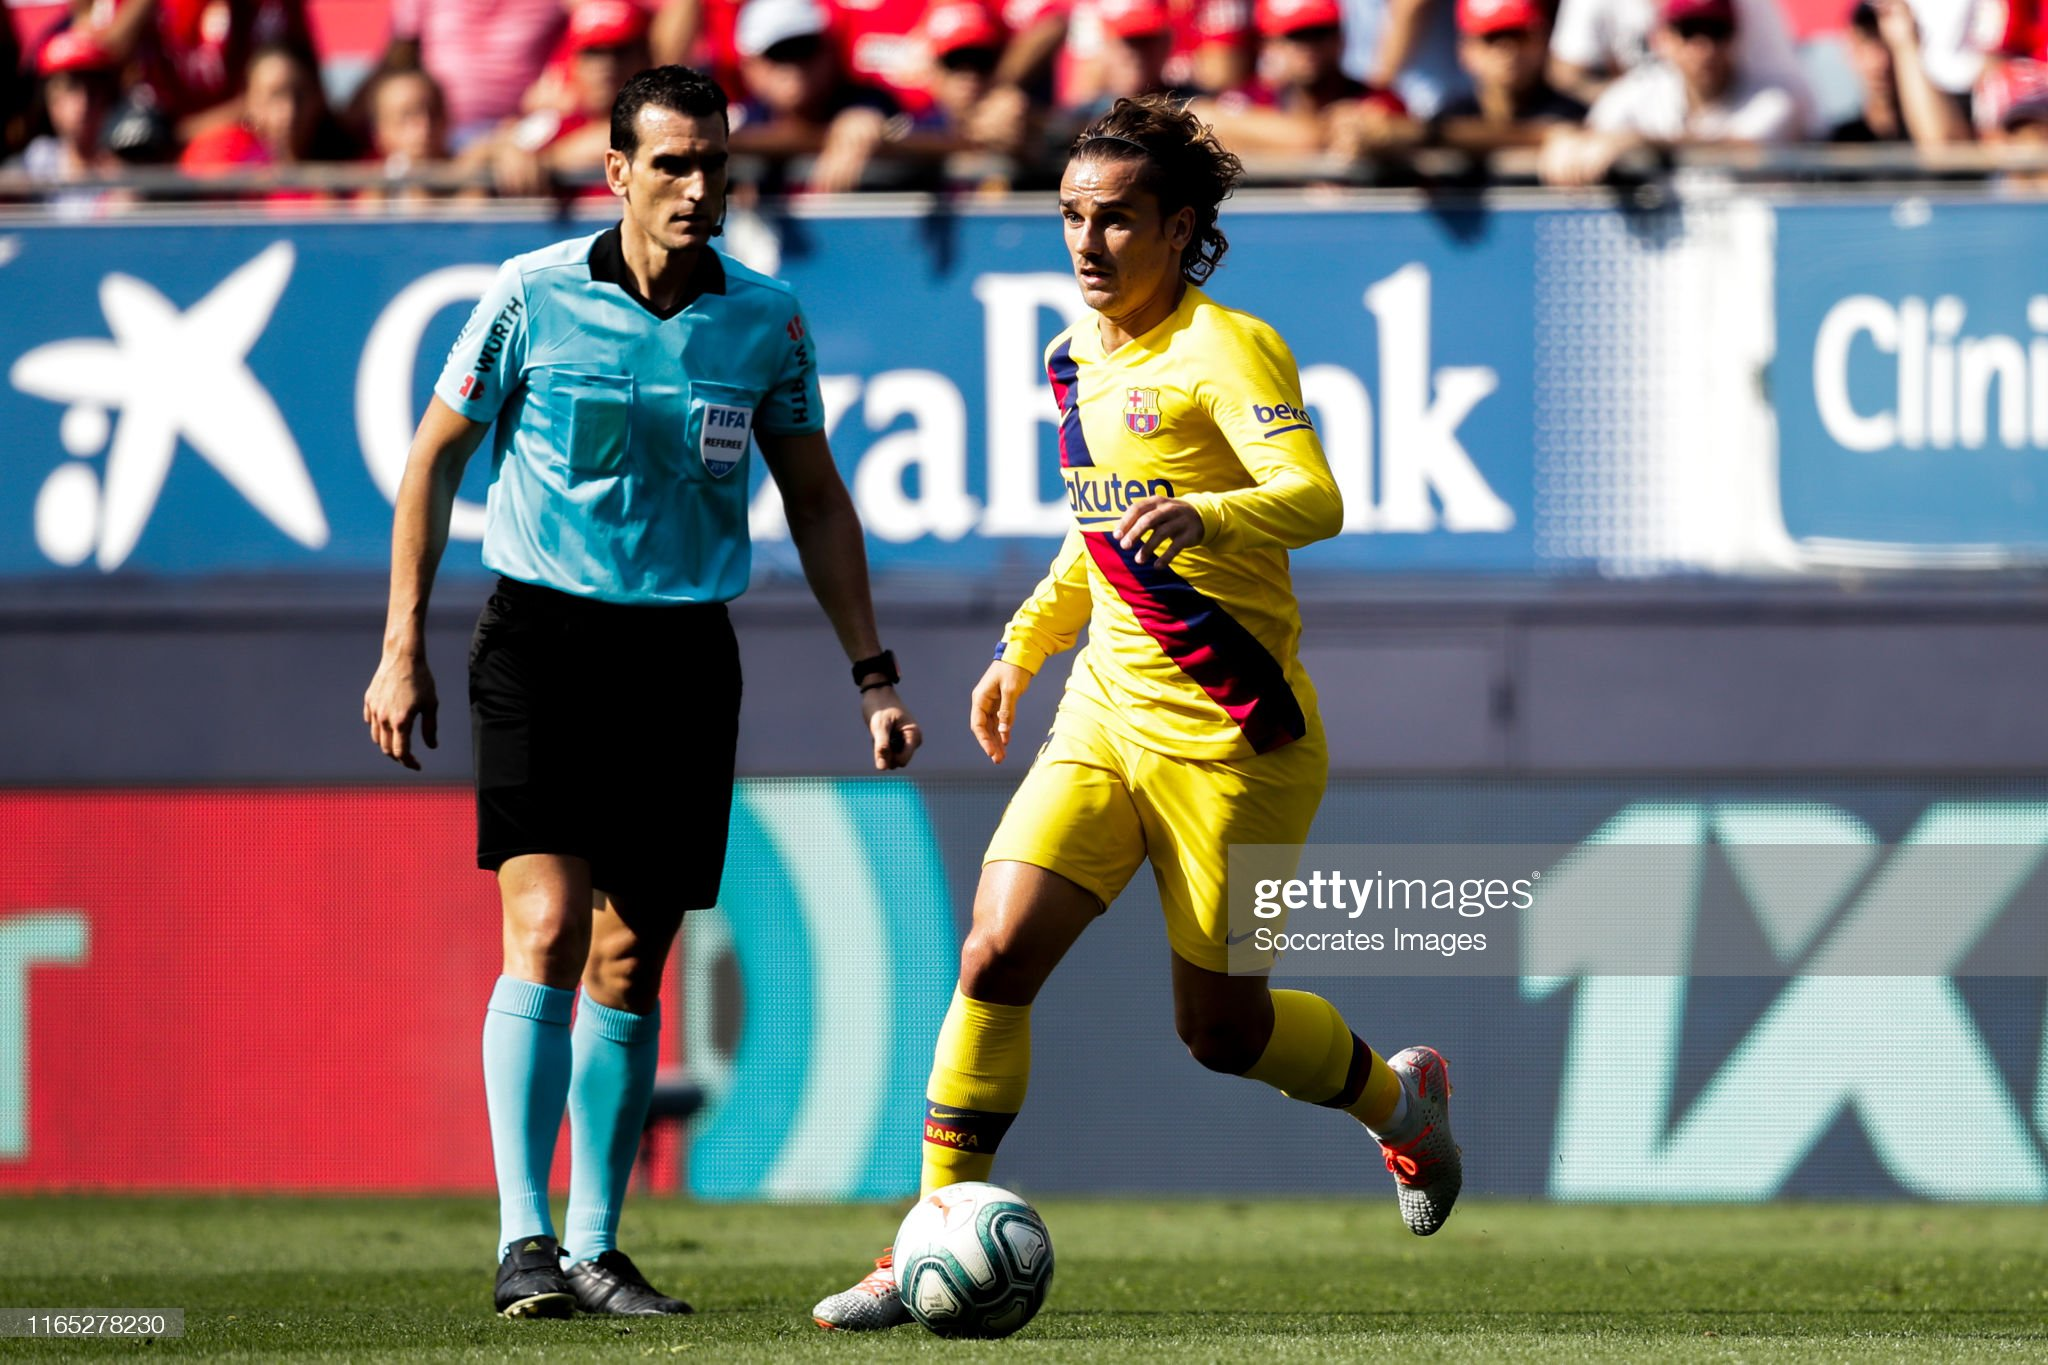 صور مباراة : أوساسونا - برشلونة 2-2 ( 31-08-2019 )  Antoine-griezmann-of-fc-barcelona-during-the-la-liga-santander-match-picture-id1165278230?s=2048x2048